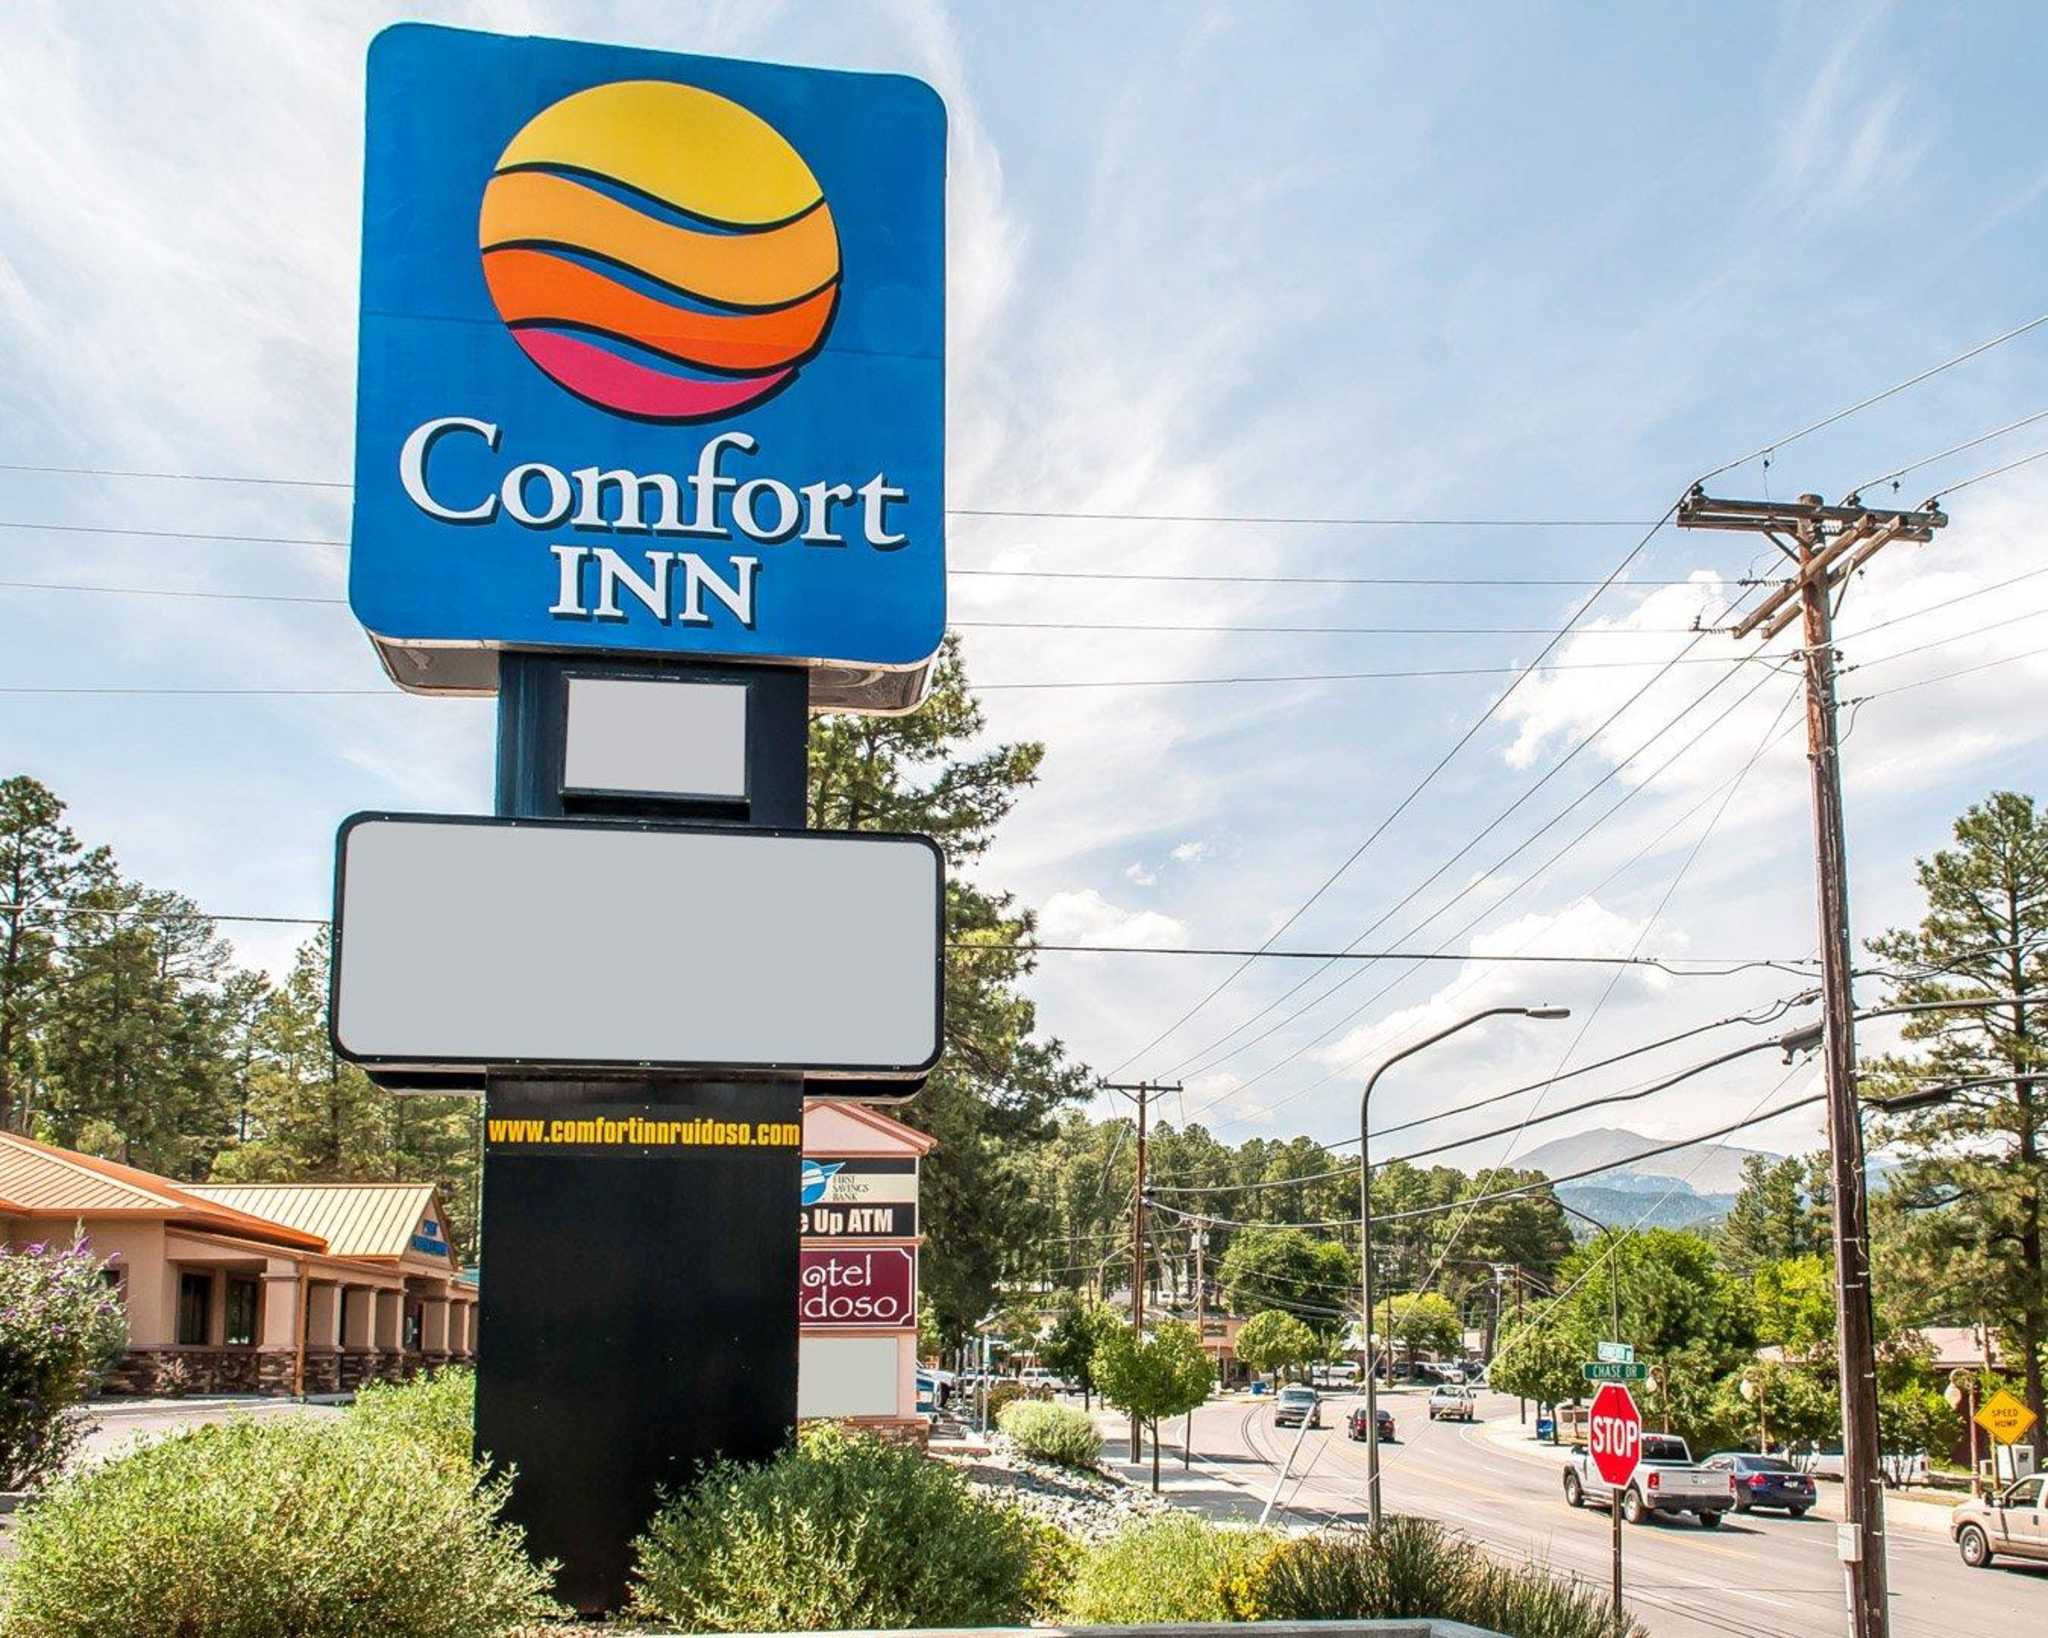 Comfort Inn Midtown image 1